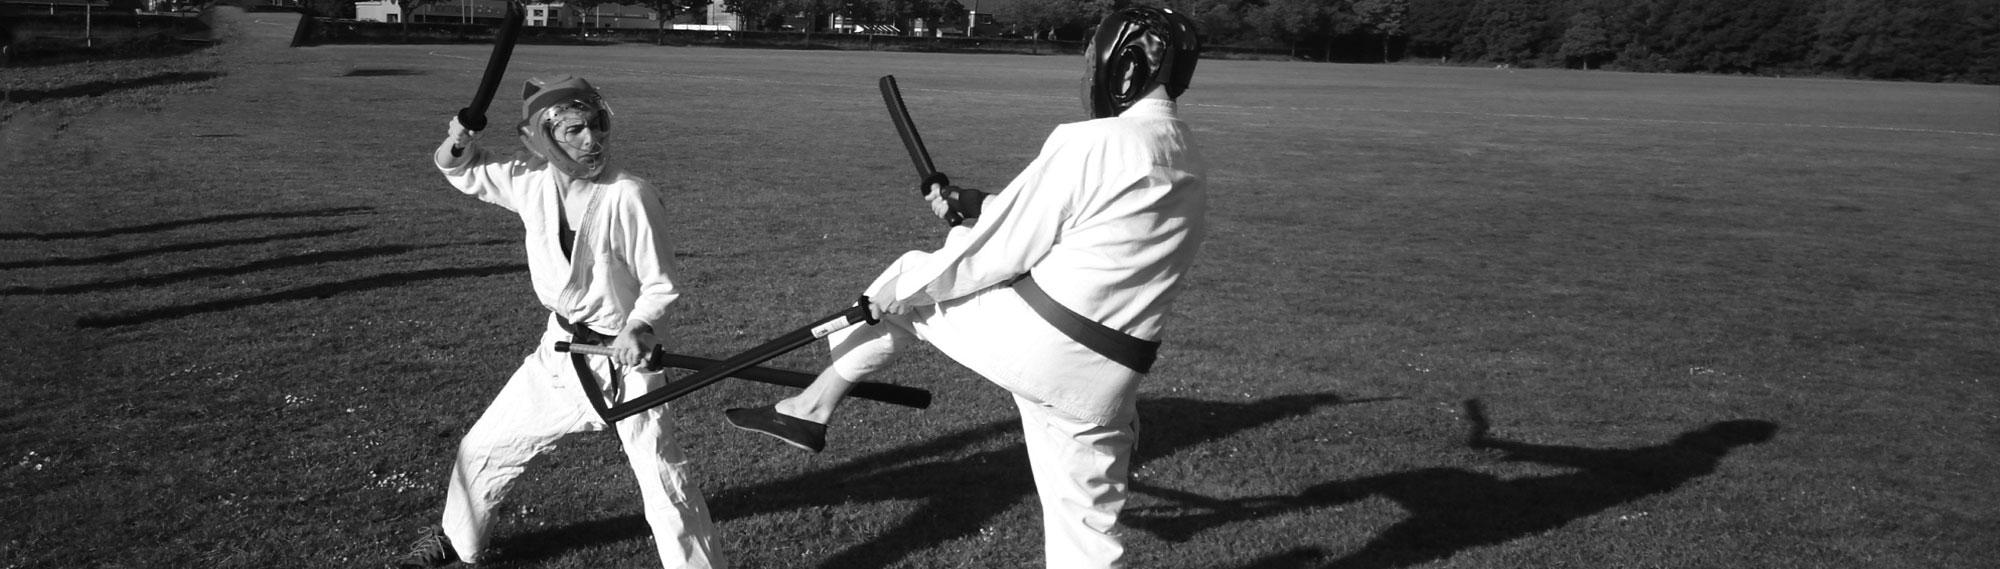 Sports Chanbara